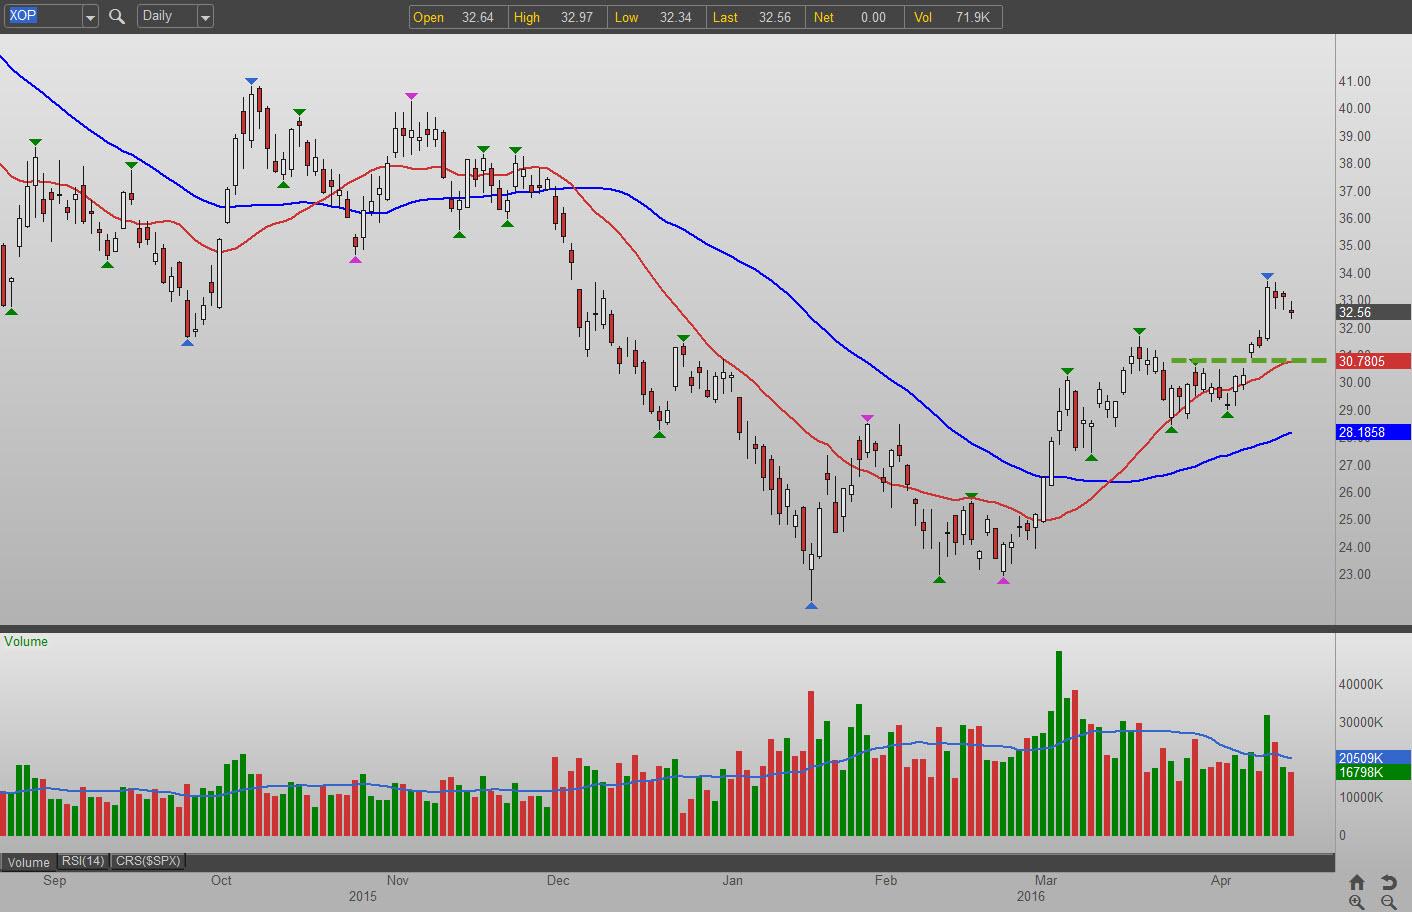 3 Plays for Energy Stocks: SPDR S&P Oil & Gas Explore & Prod. (ETF) (XOP)